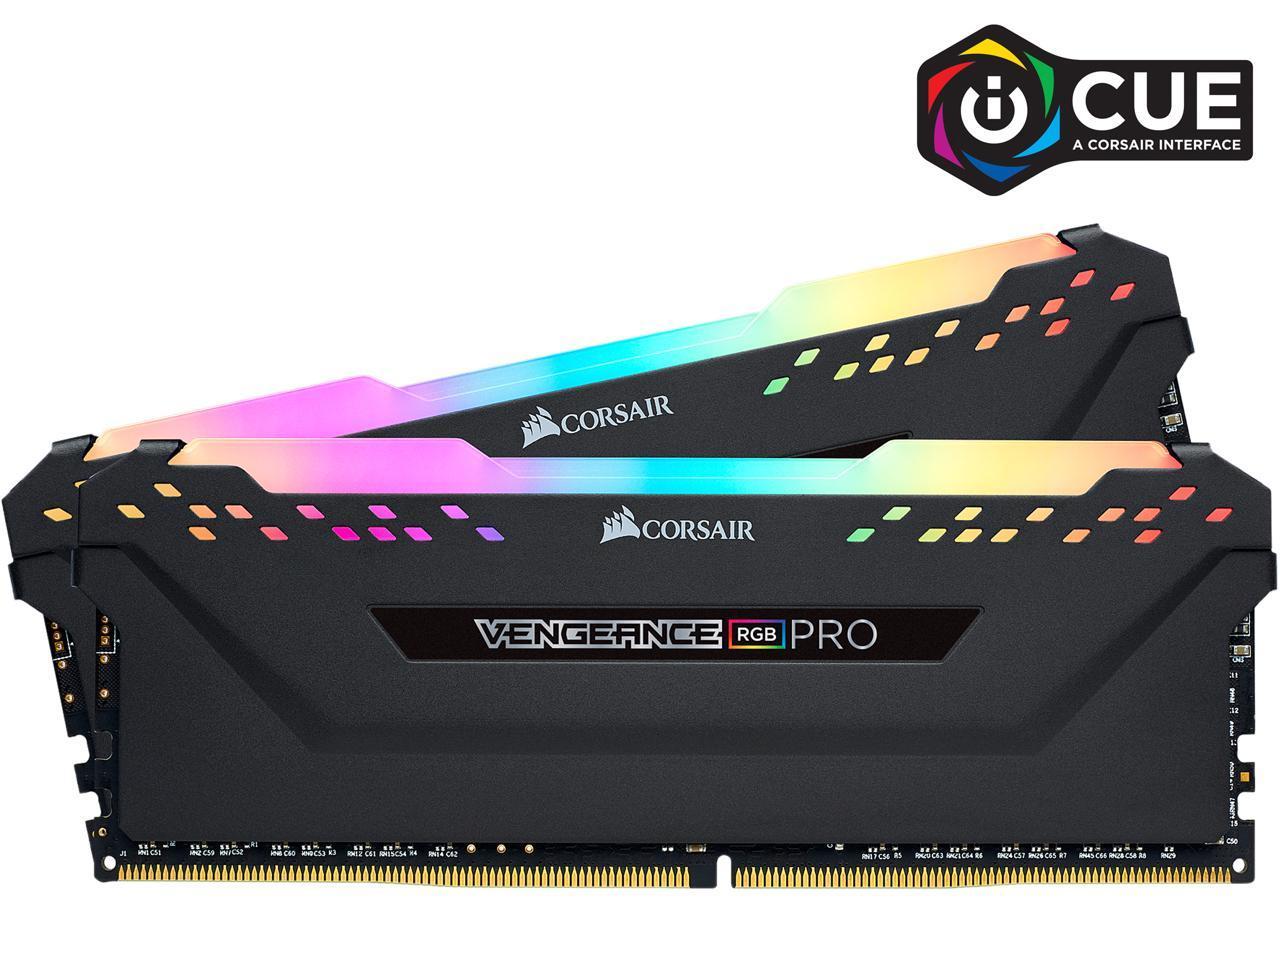 32GB (2x 16) CORSAIR Vengeance RGB Pro DDR4 3600 Desktop RAM kit @Newegg $155